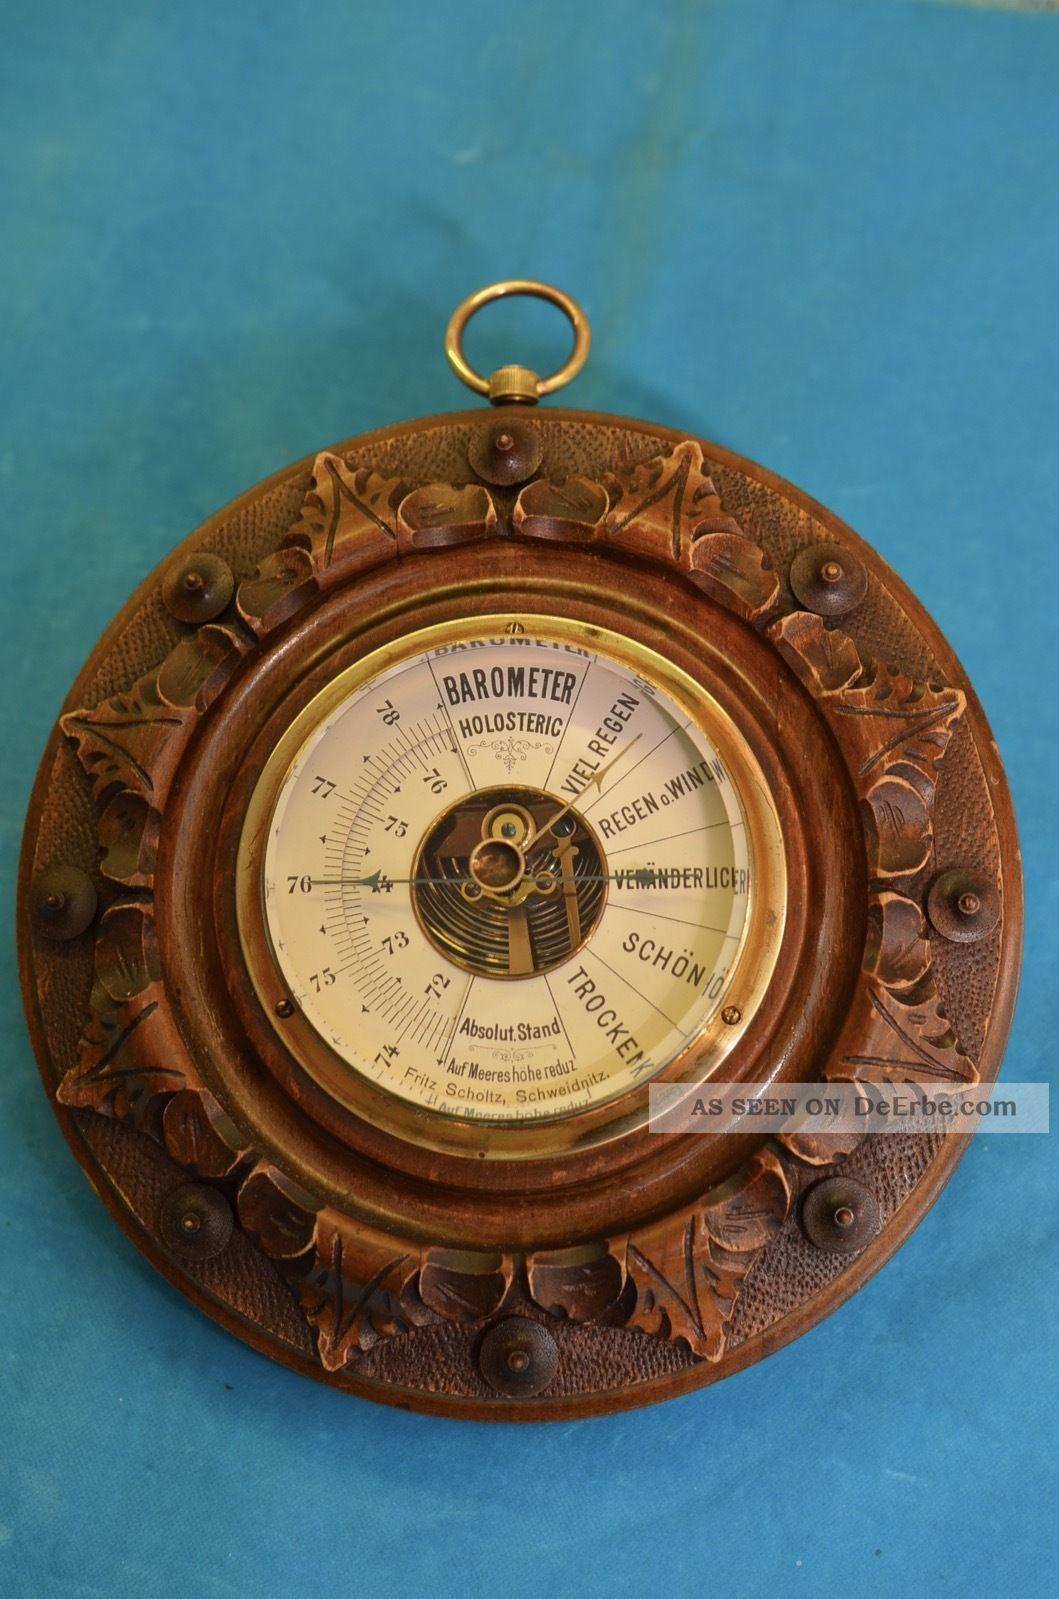 Altes Art Deco Barometer Um 1920/1930 Technik & Instrumente Bild